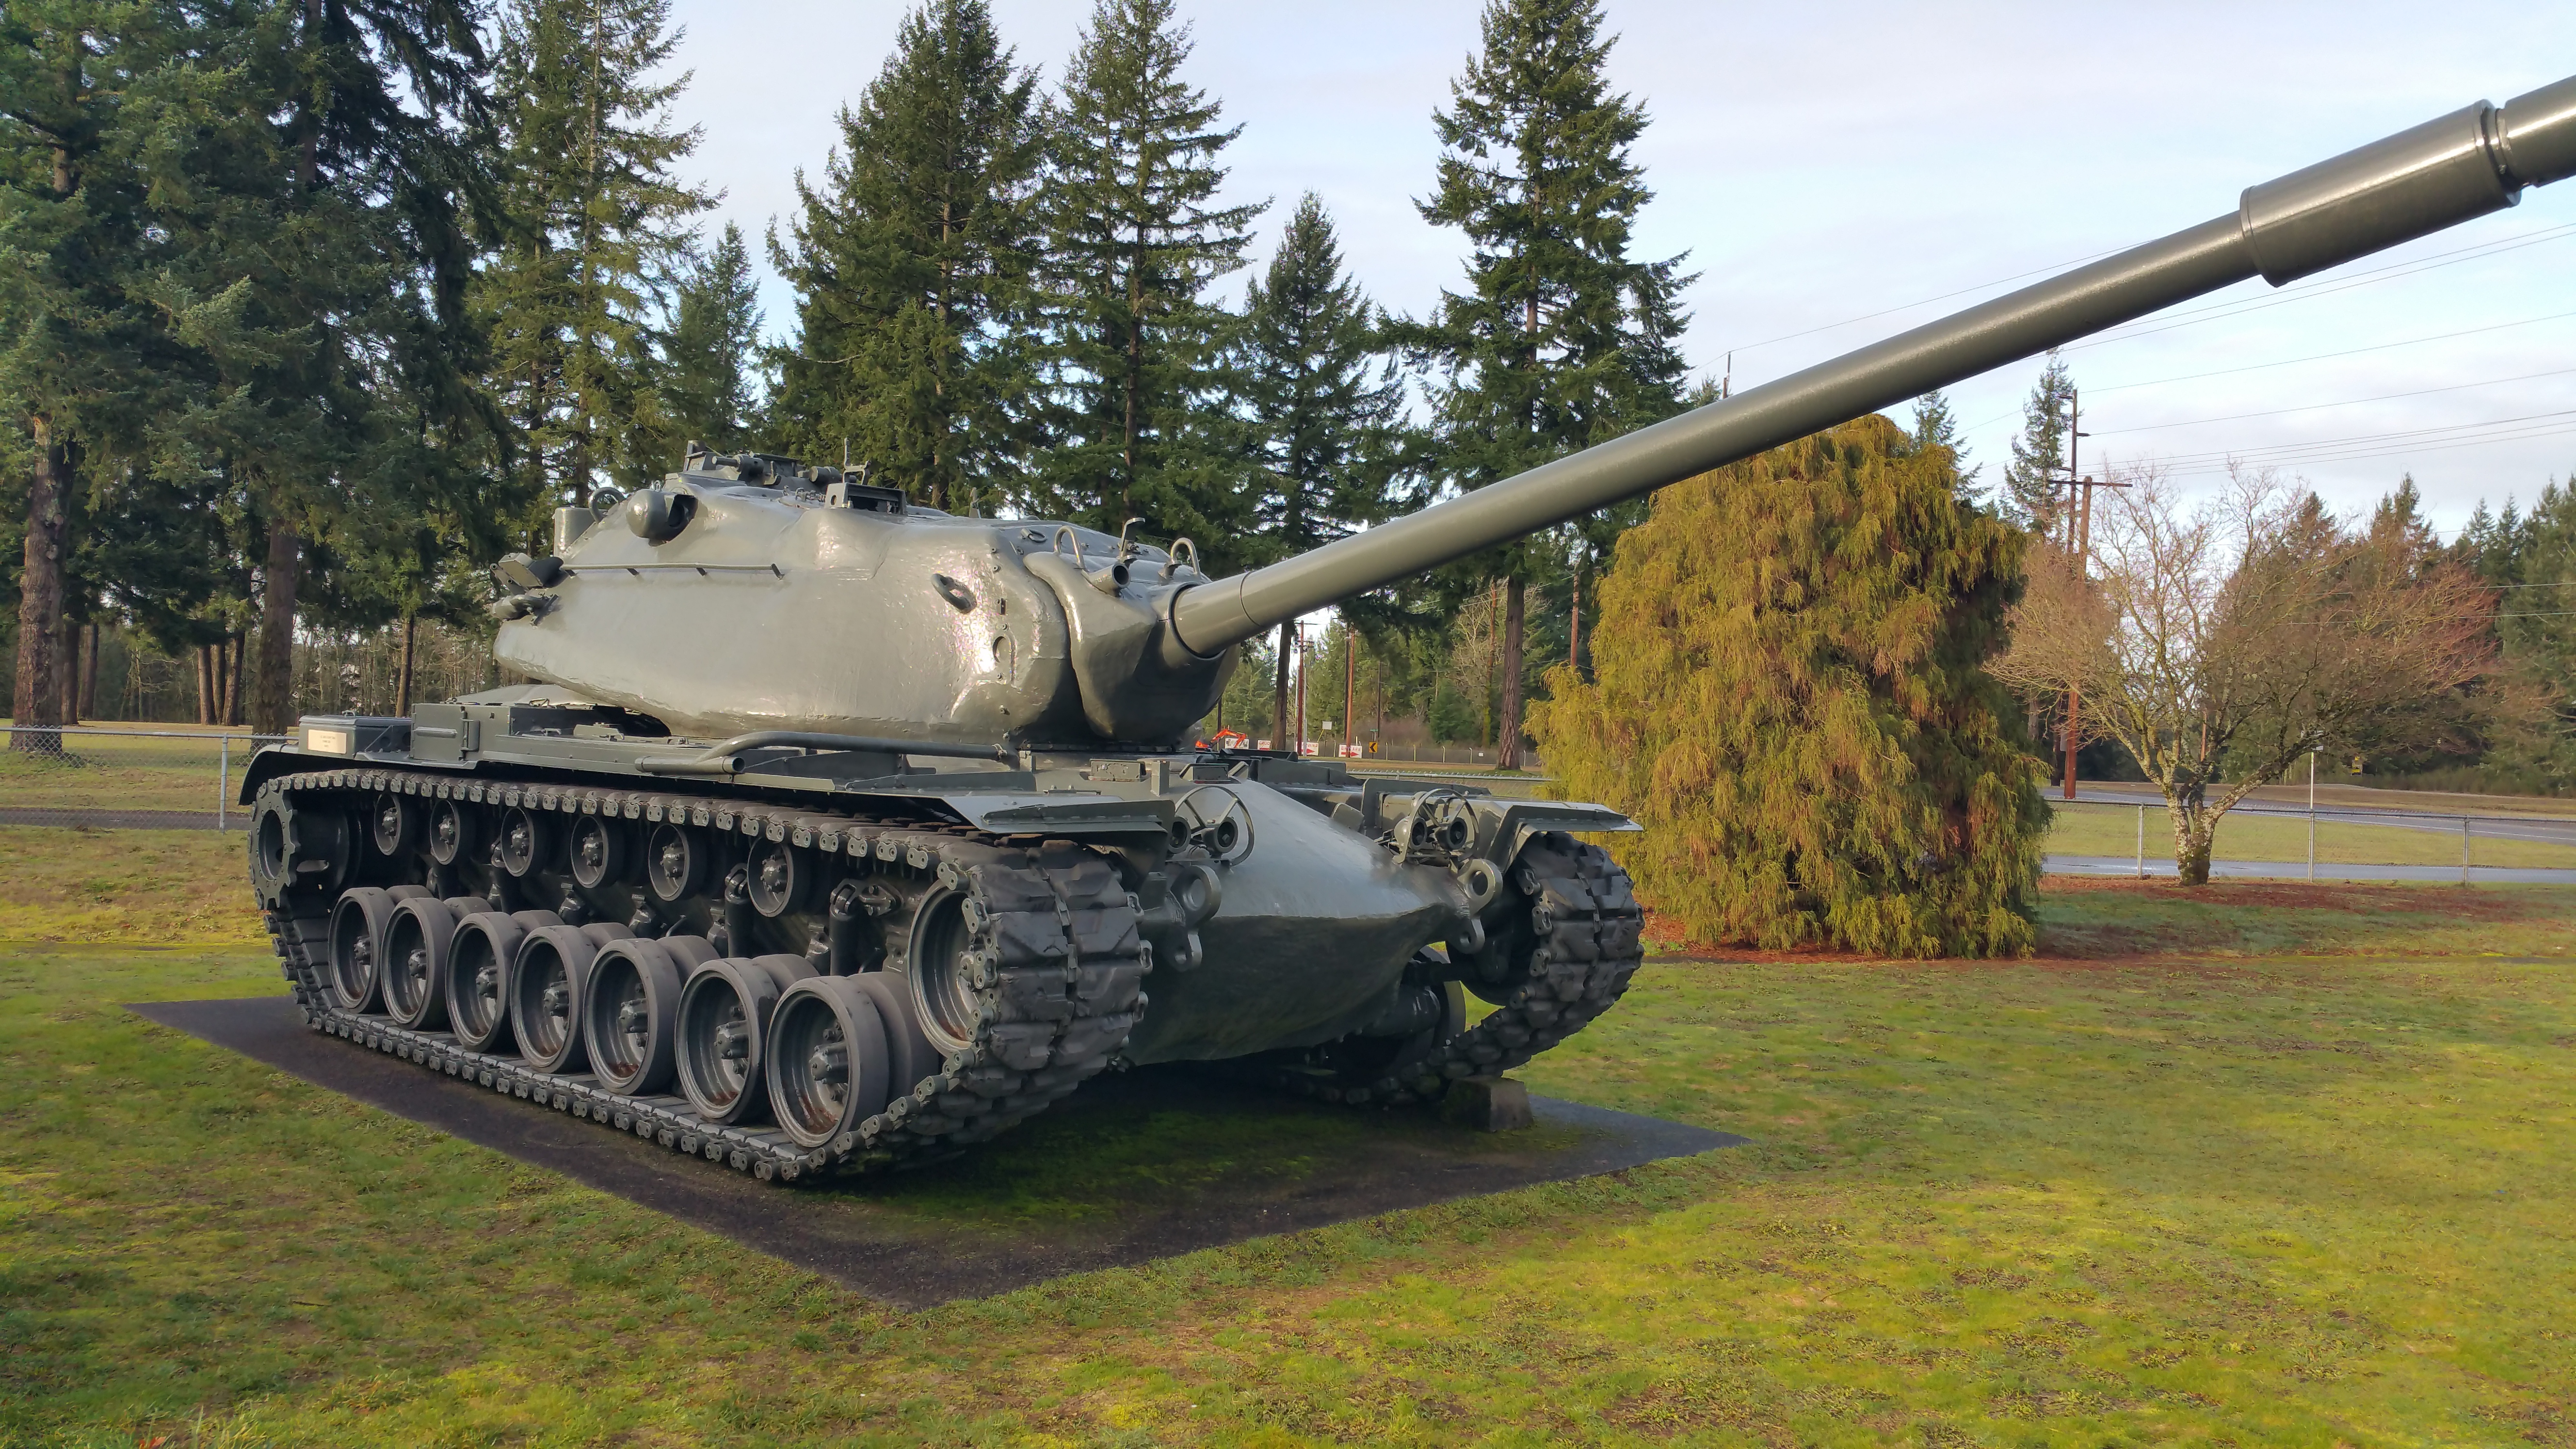 Entfernungsmesser Us Army : M103 kampfpanzer u2013 wikipedia